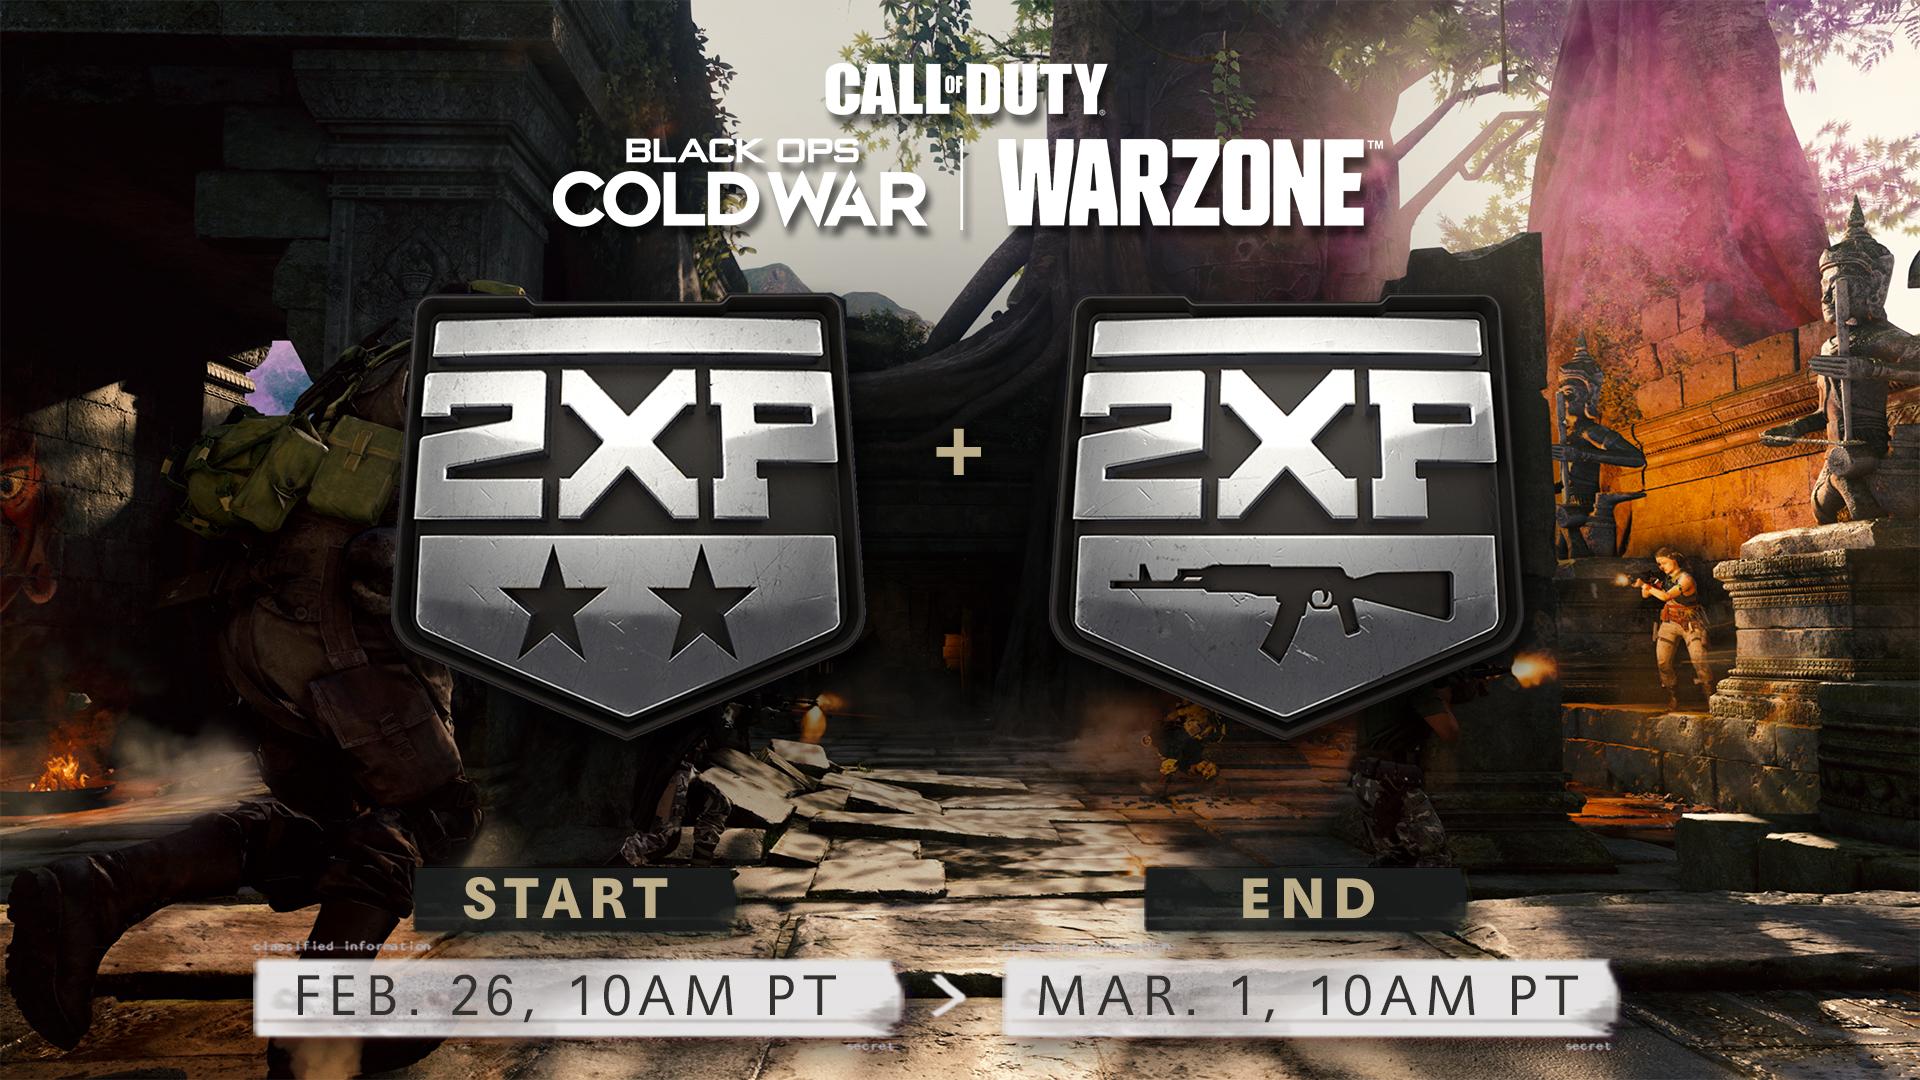 Warzone Double XP image